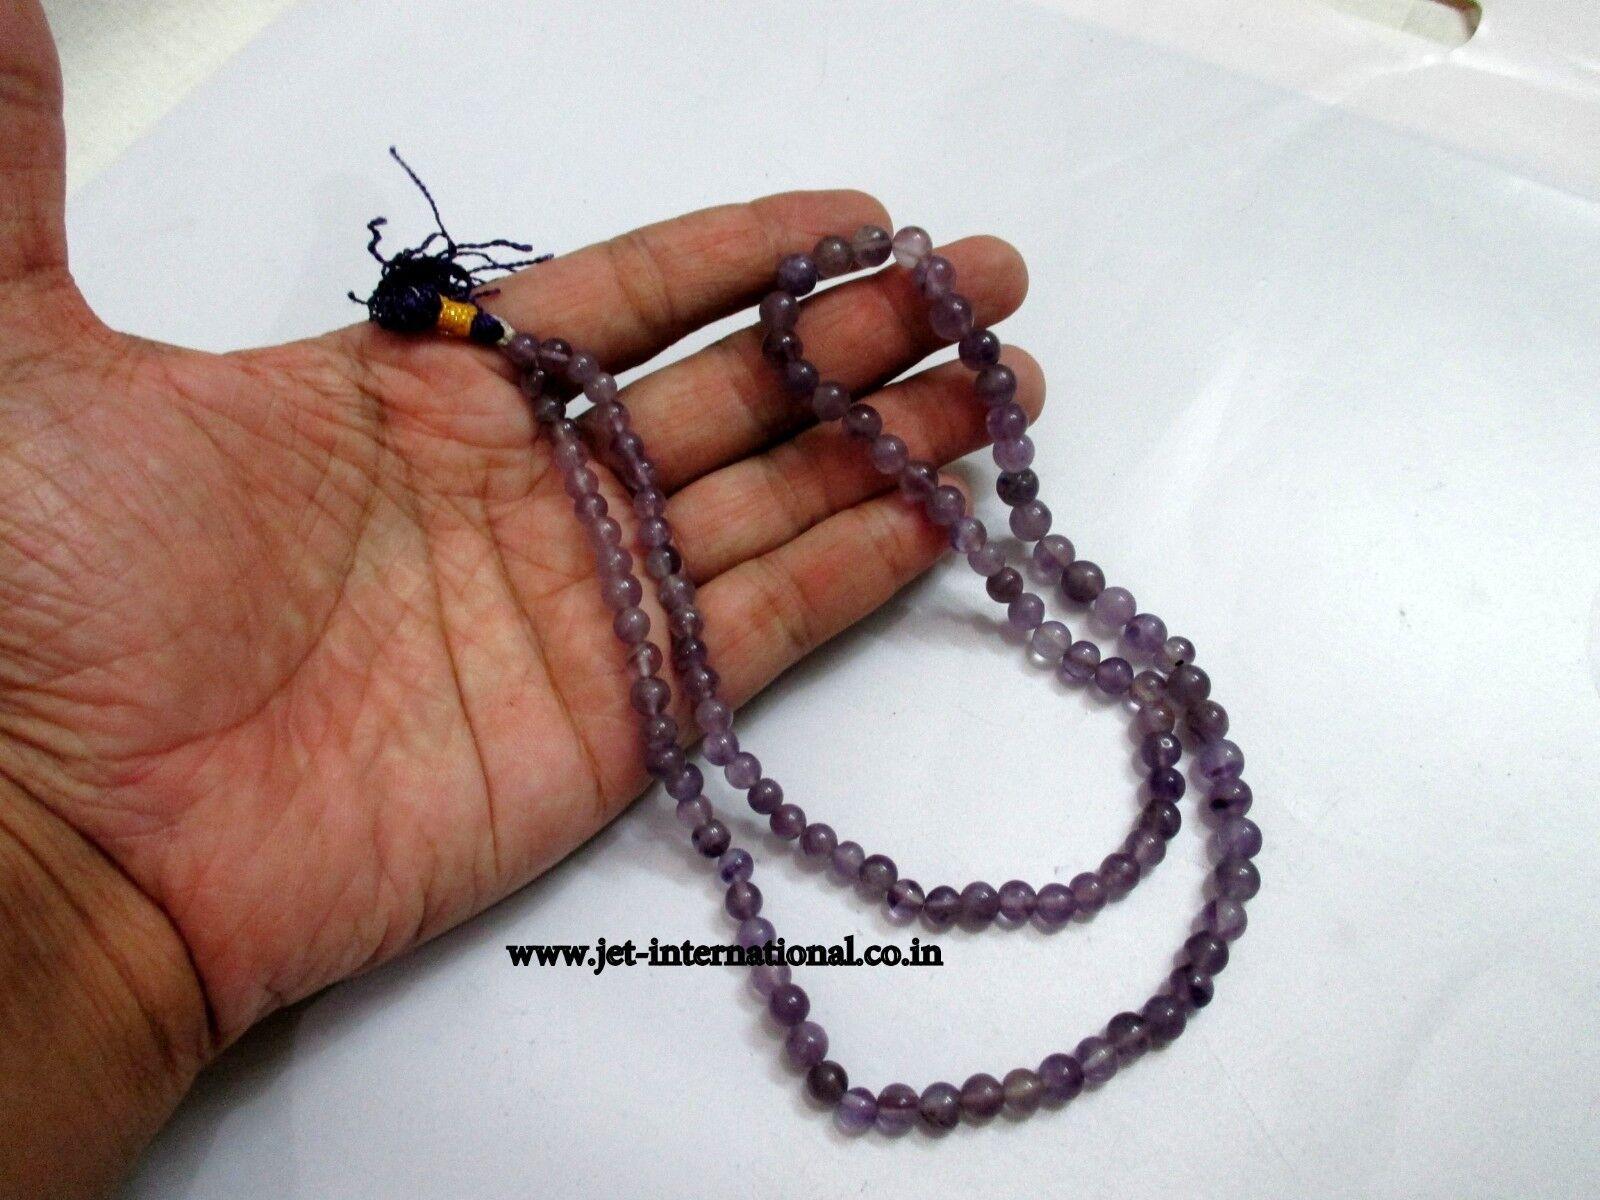 Details about Jet Amethyst Japa Mala 6 mm 108 + 1 Prayer Beads Meditation  Concentration